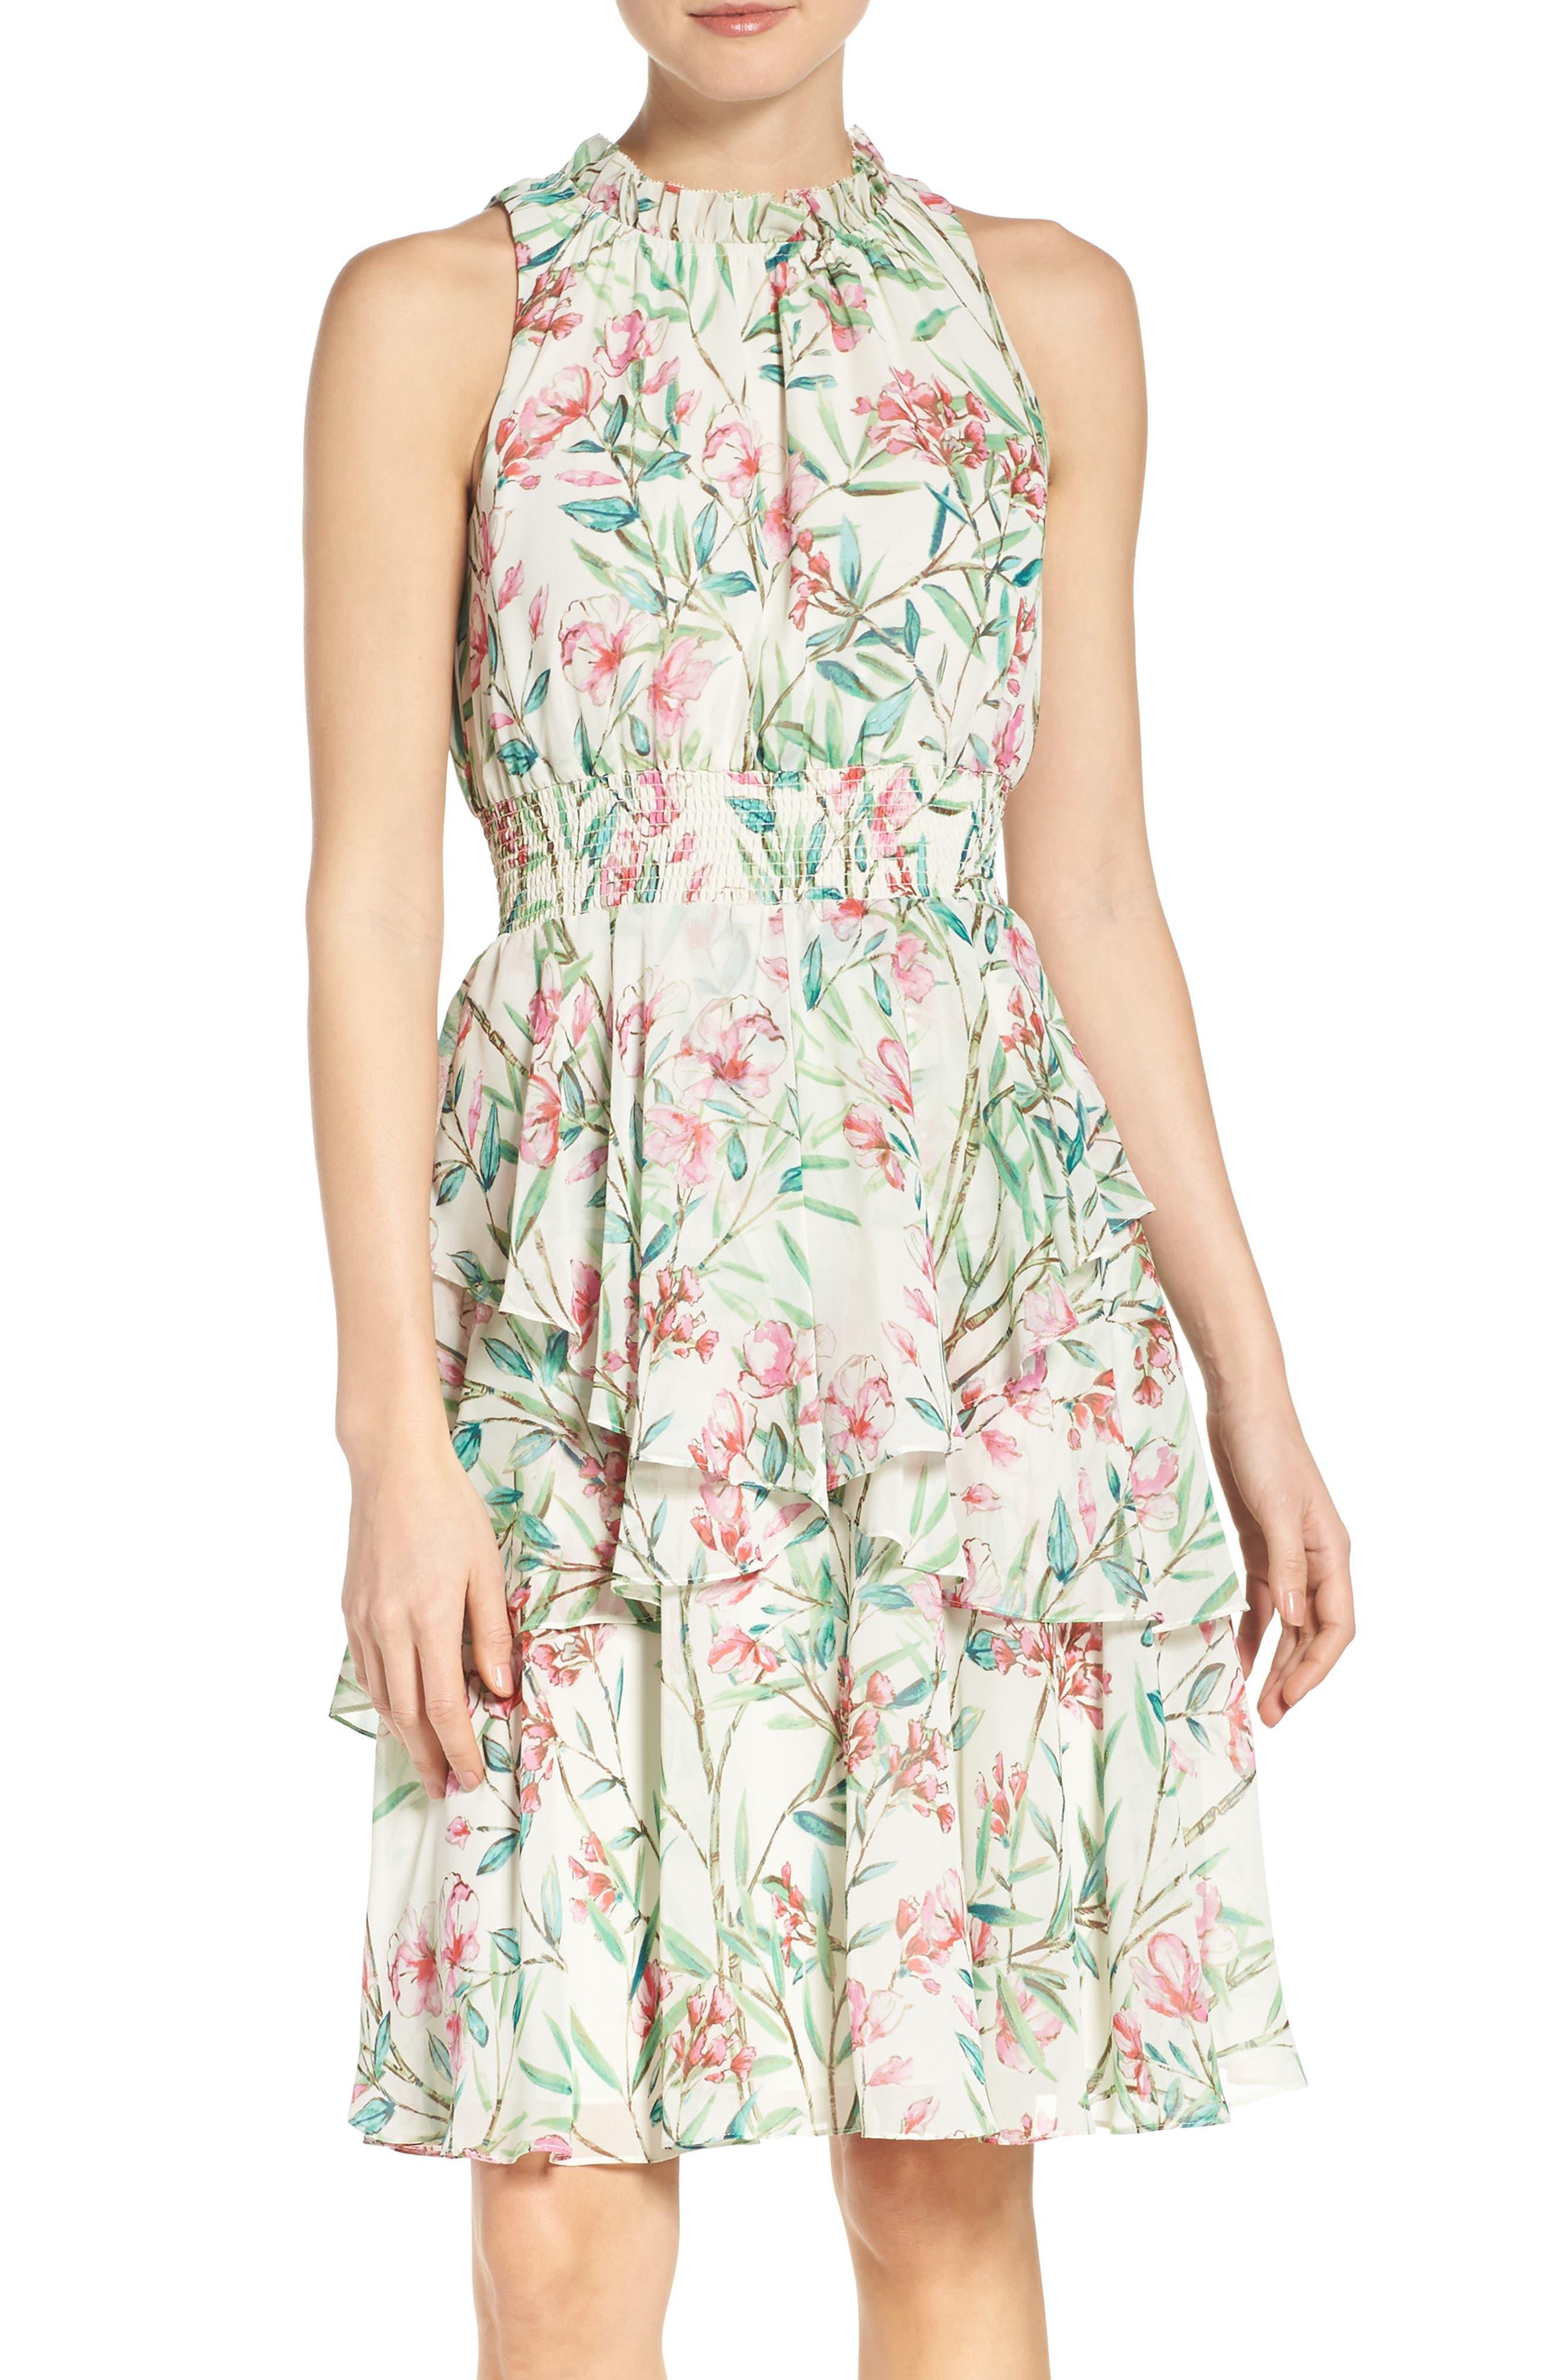 Chiffon Fit & Flare Dress,                             Main thumbnail 1, color,                             Ivory/ Pink/ Green